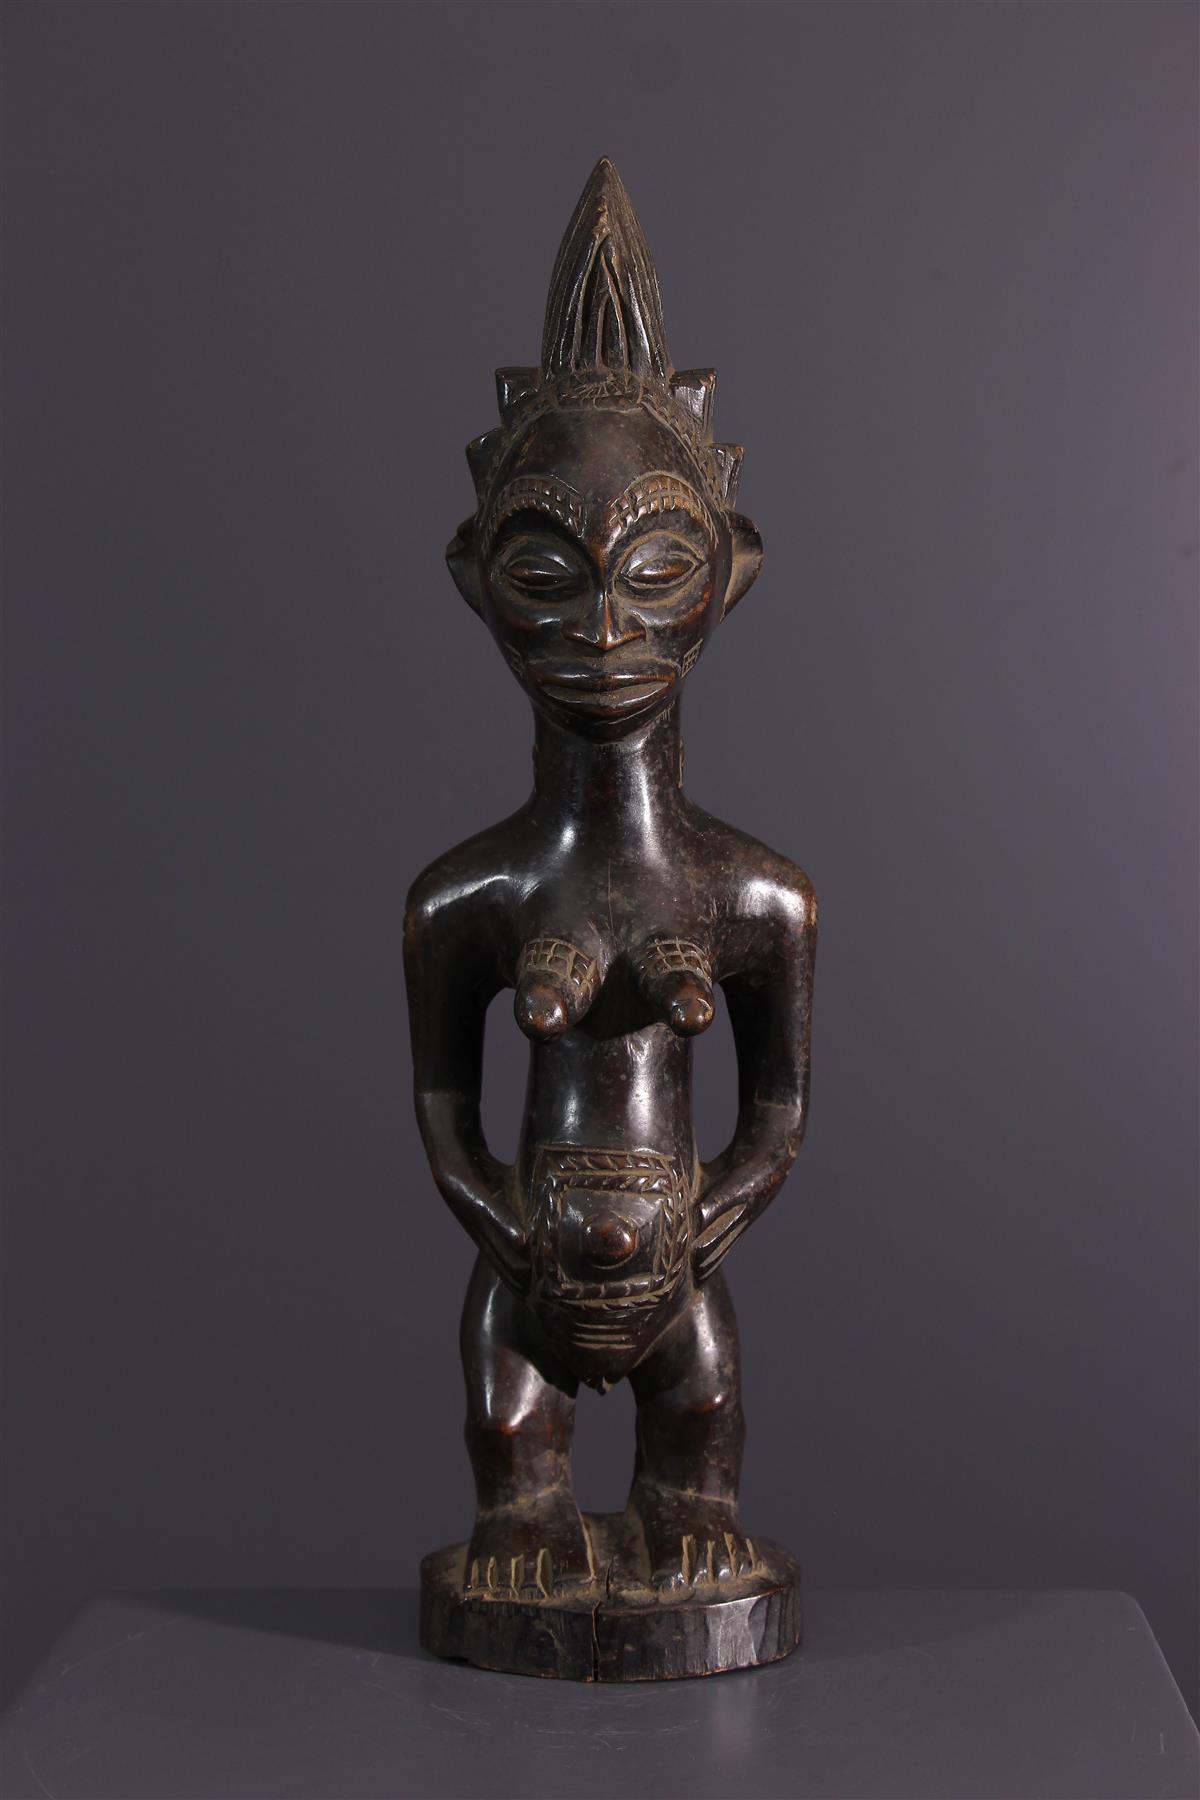 Luba beeldje - Afrikaanse kunst